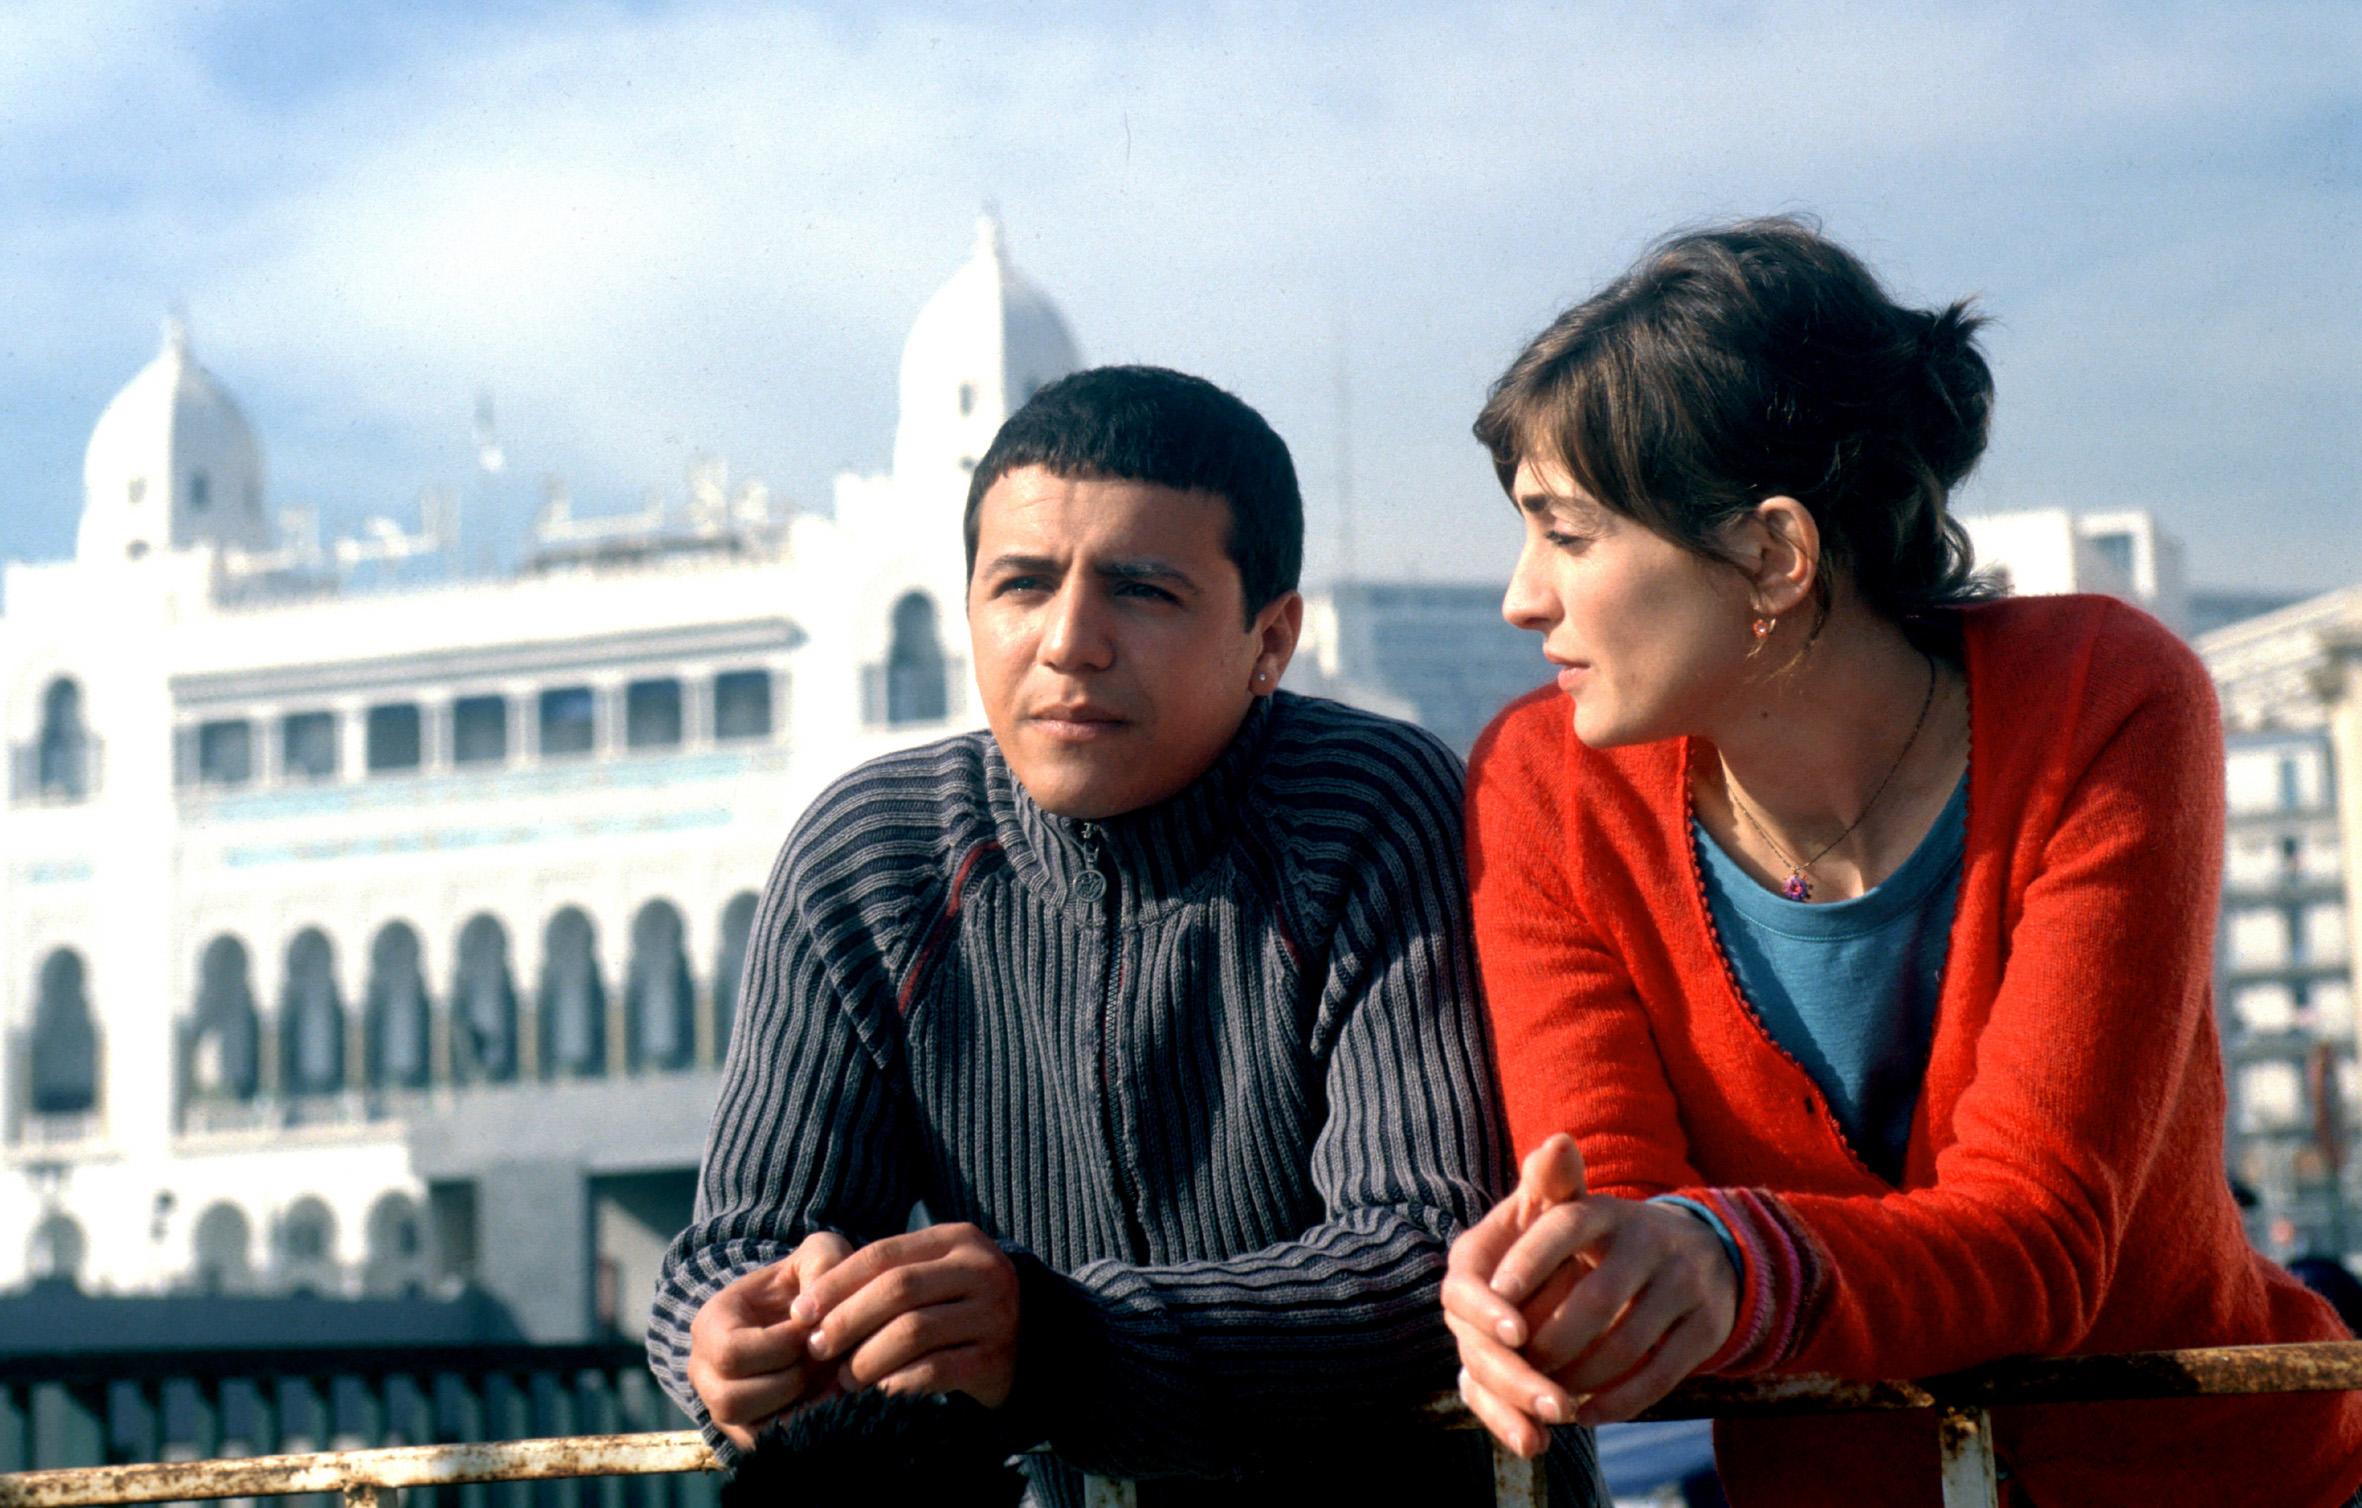 «Bab el web», de Merzak Allouache (2005)